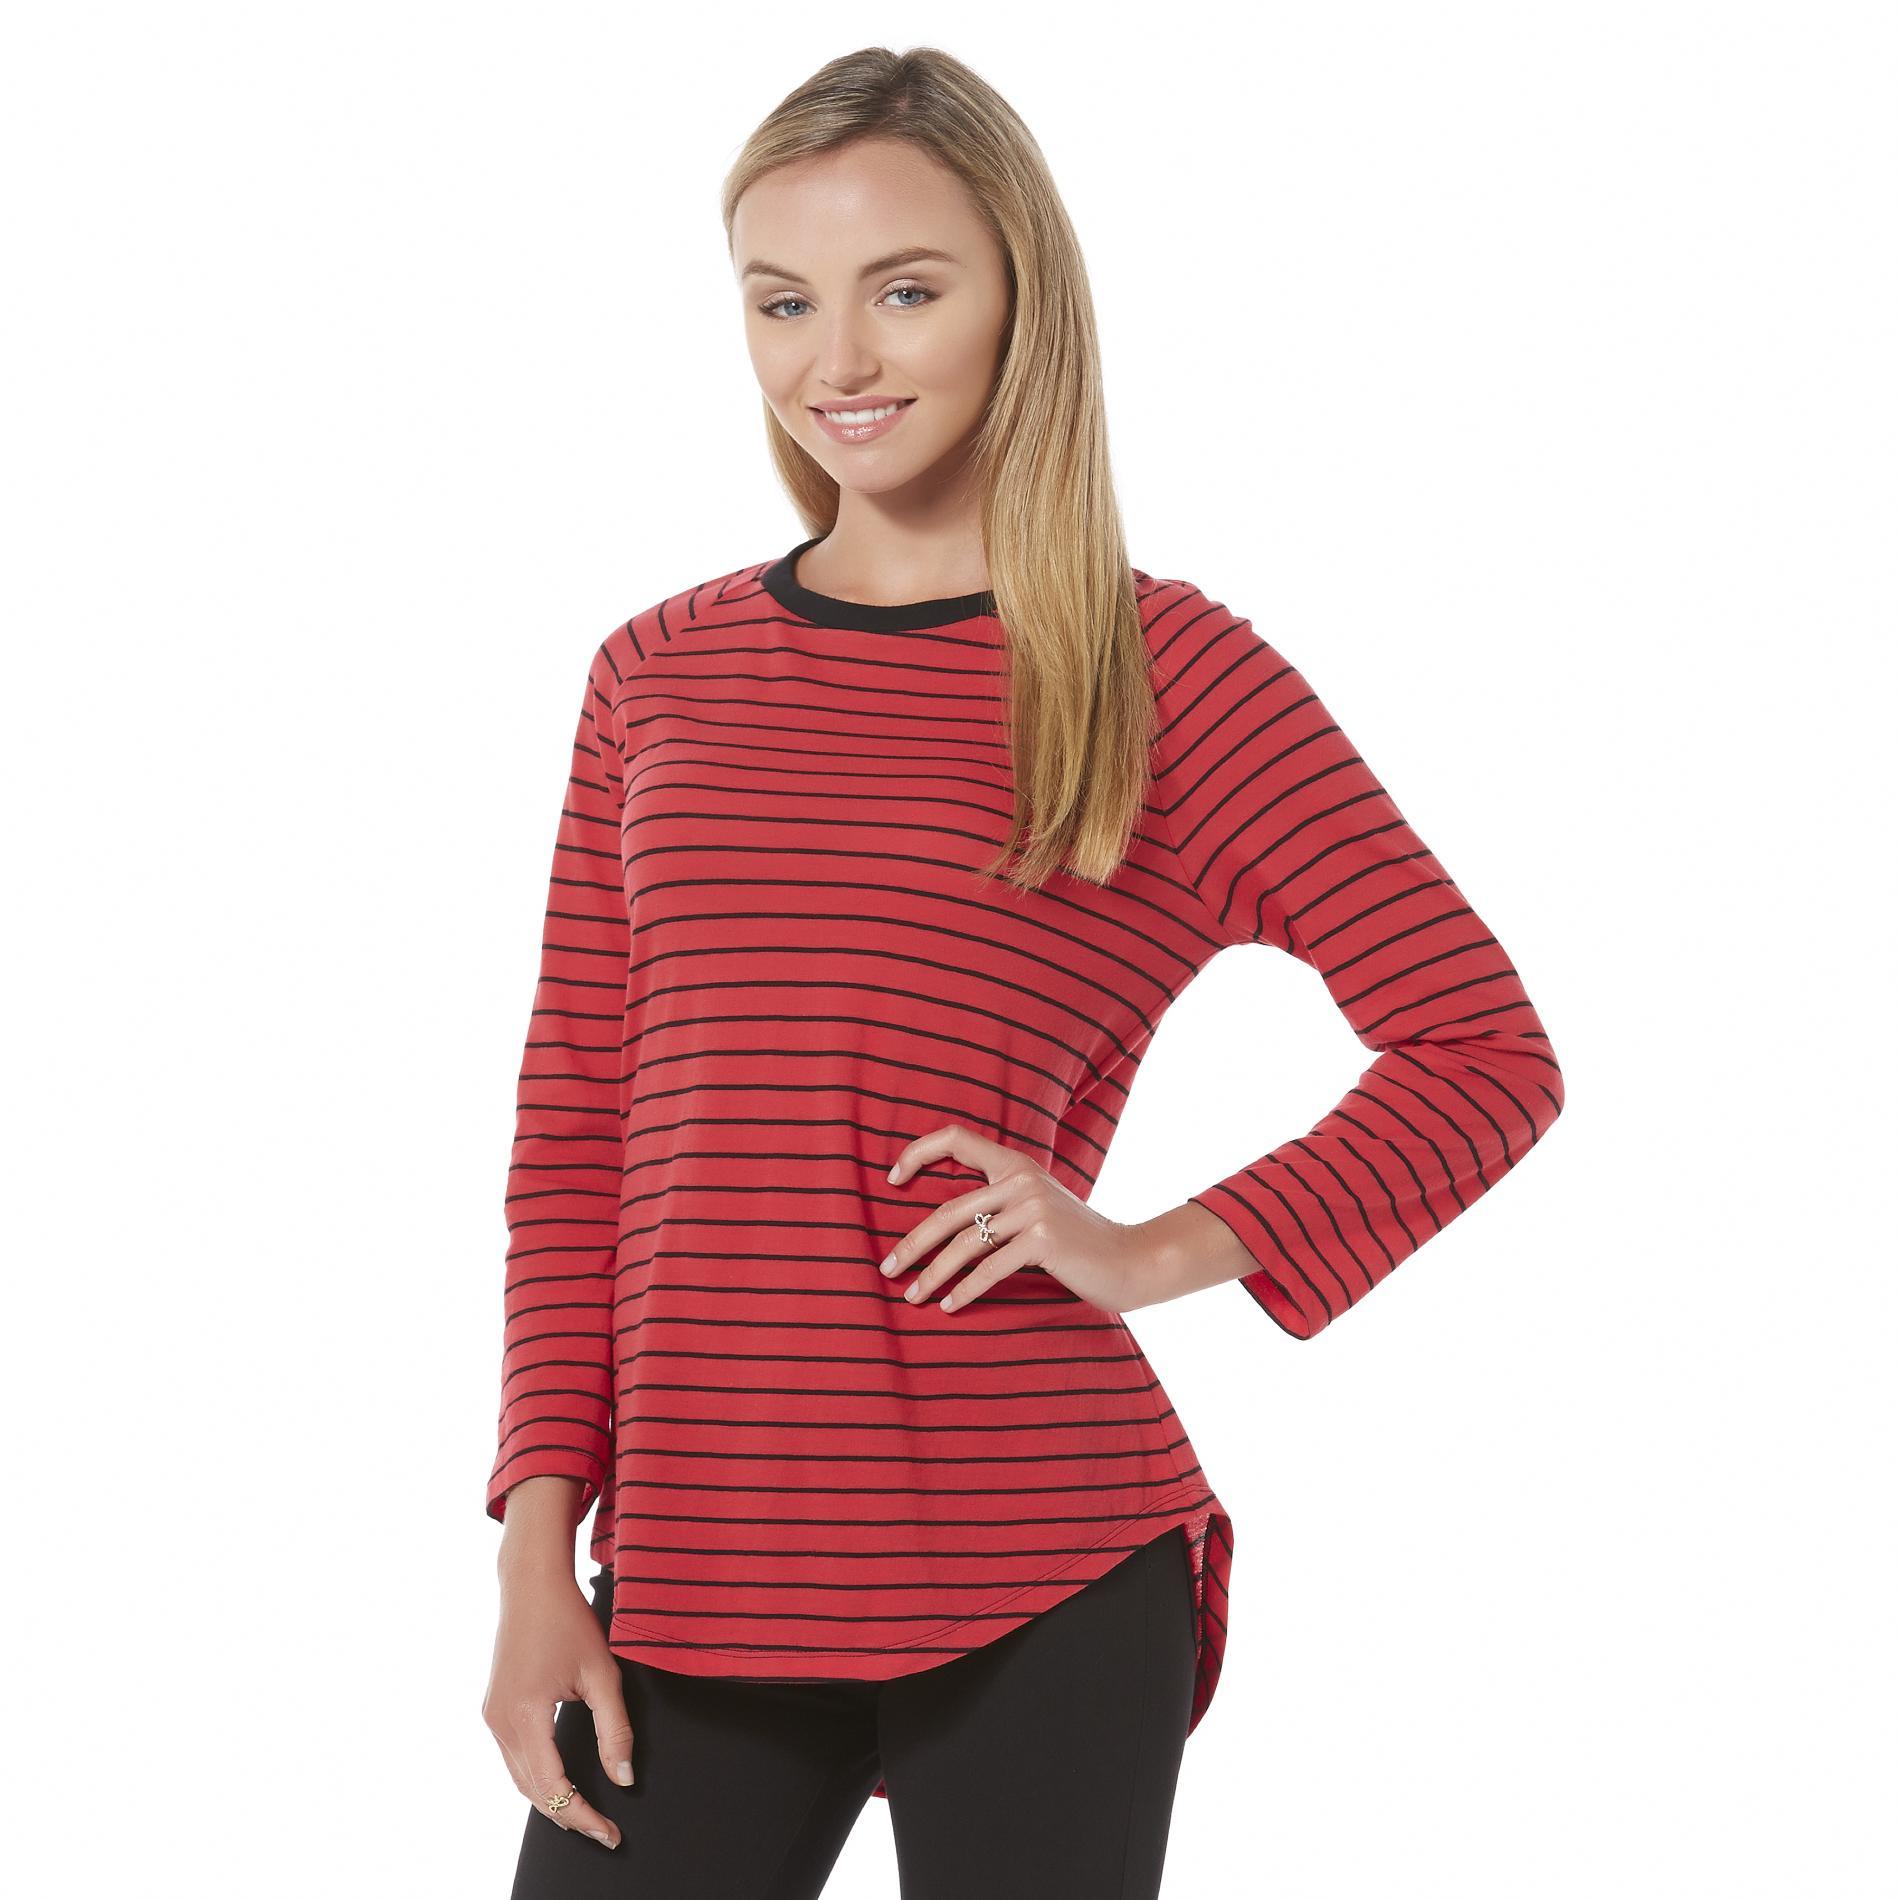 Bongo Junior's Long-Sleeve High-Low T-Shirt - Striped